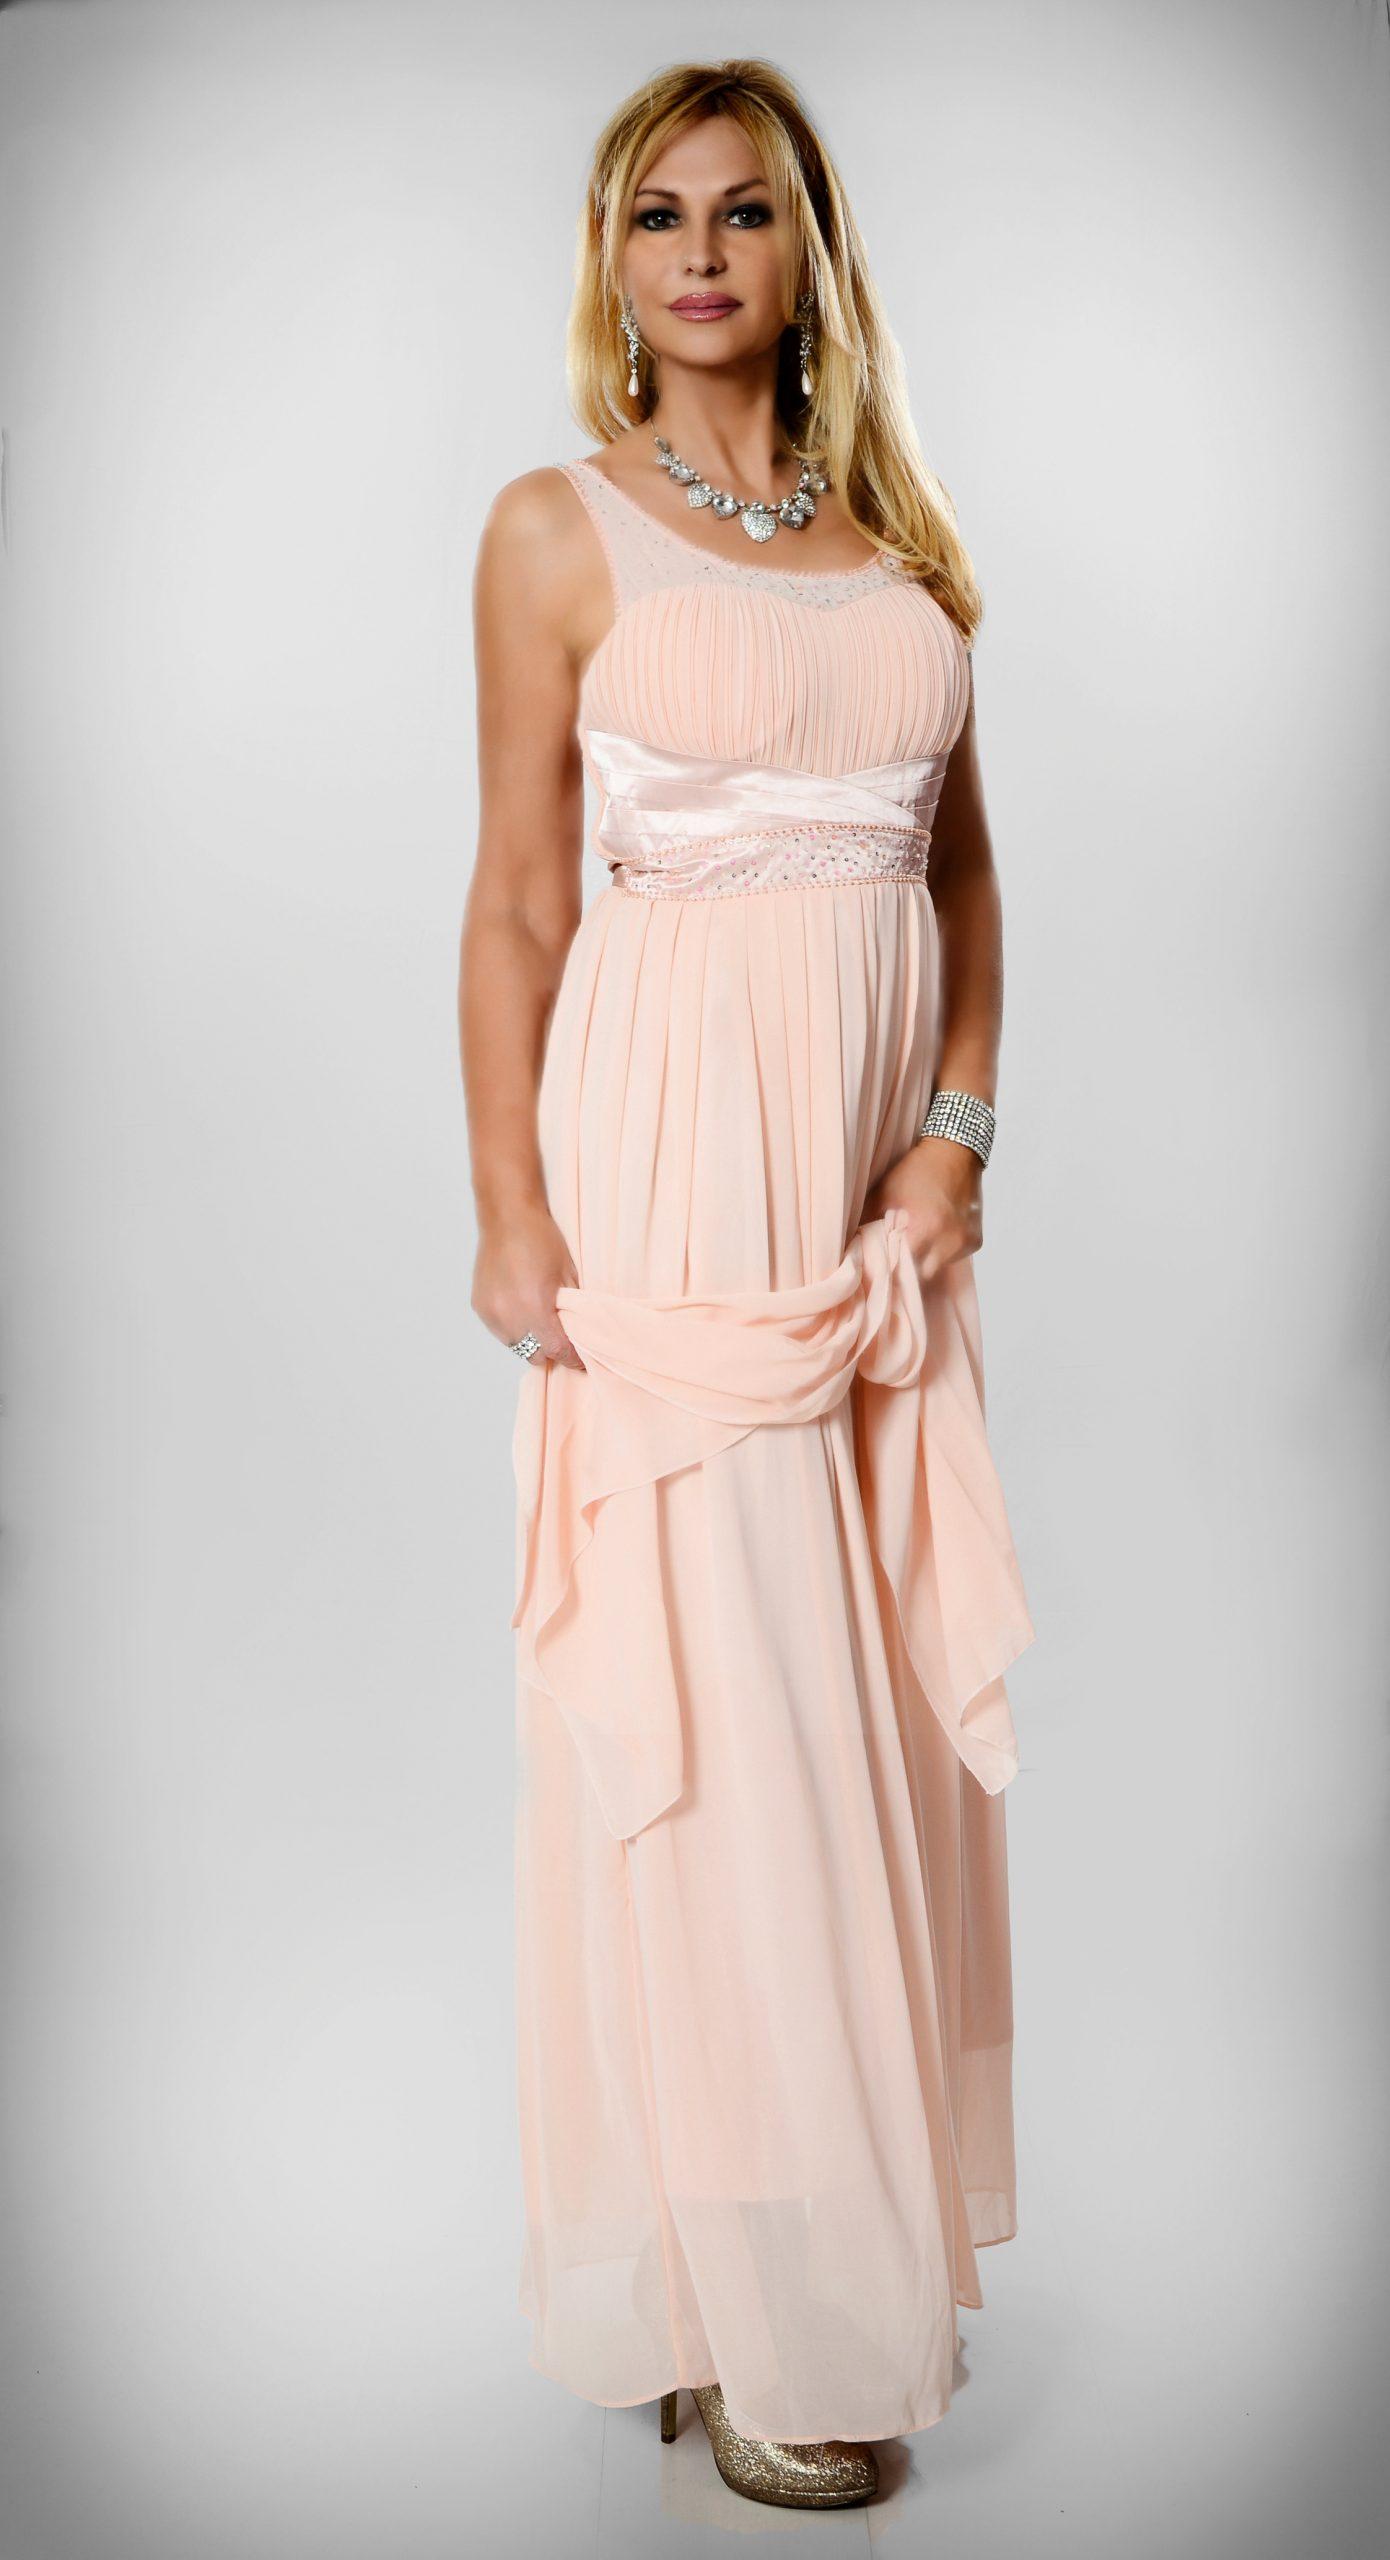 Formal Coolste Abendkleider Chur StylishAbend Perfekt Abendkleider Chur Spezialgebiet